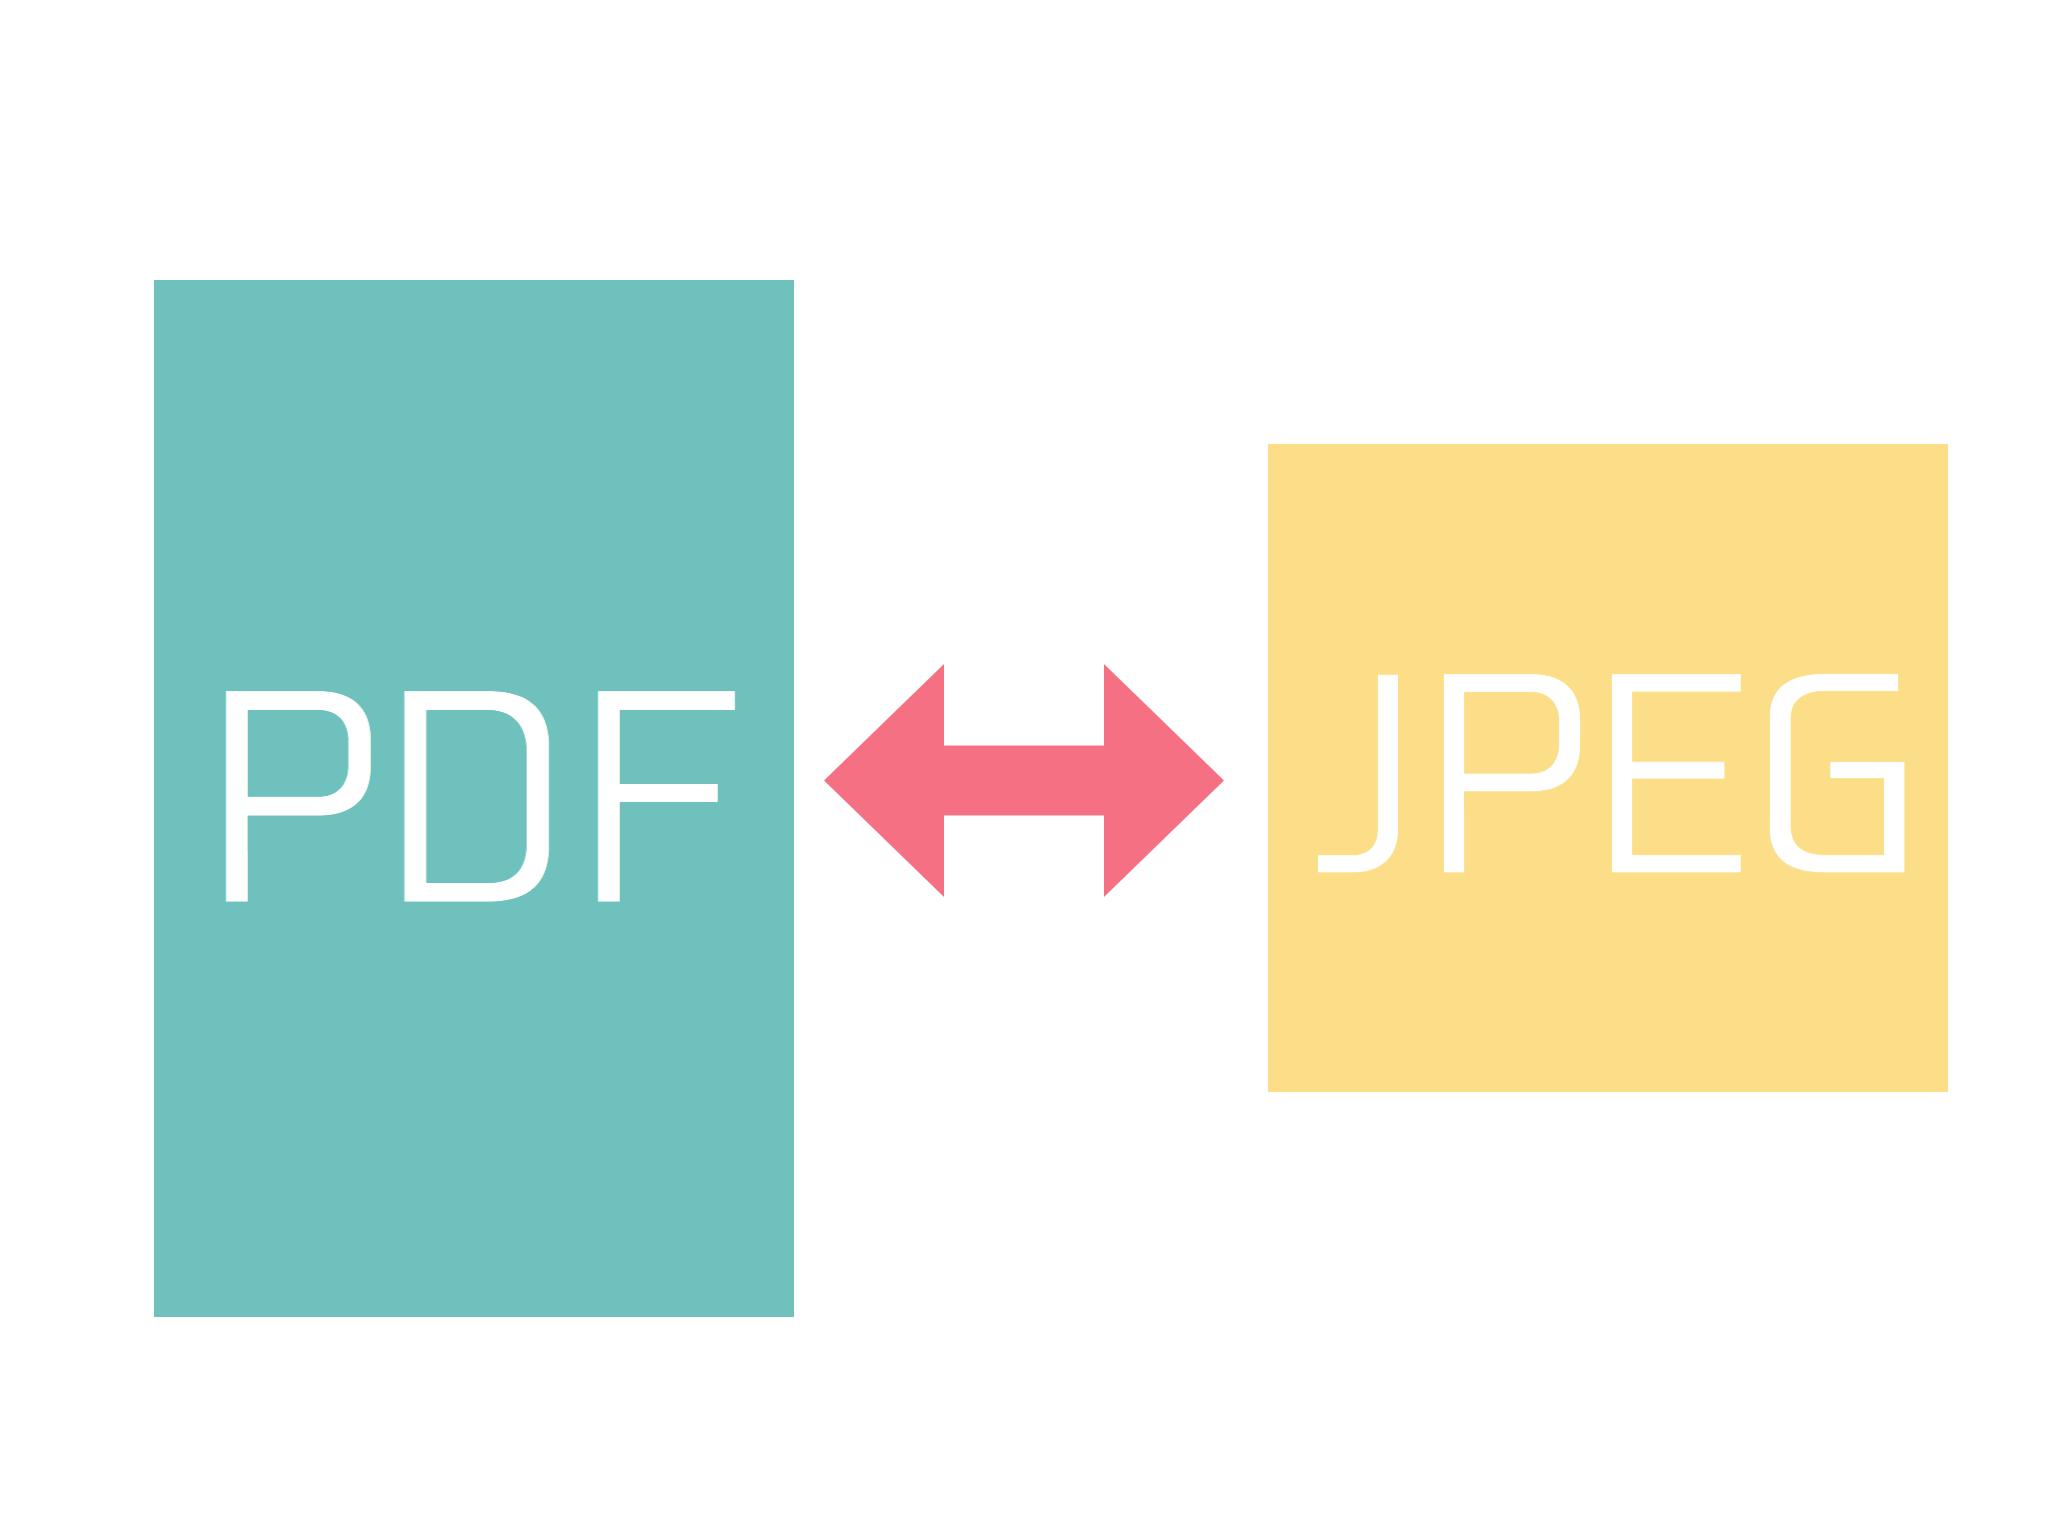 Jpg 変換 pdf